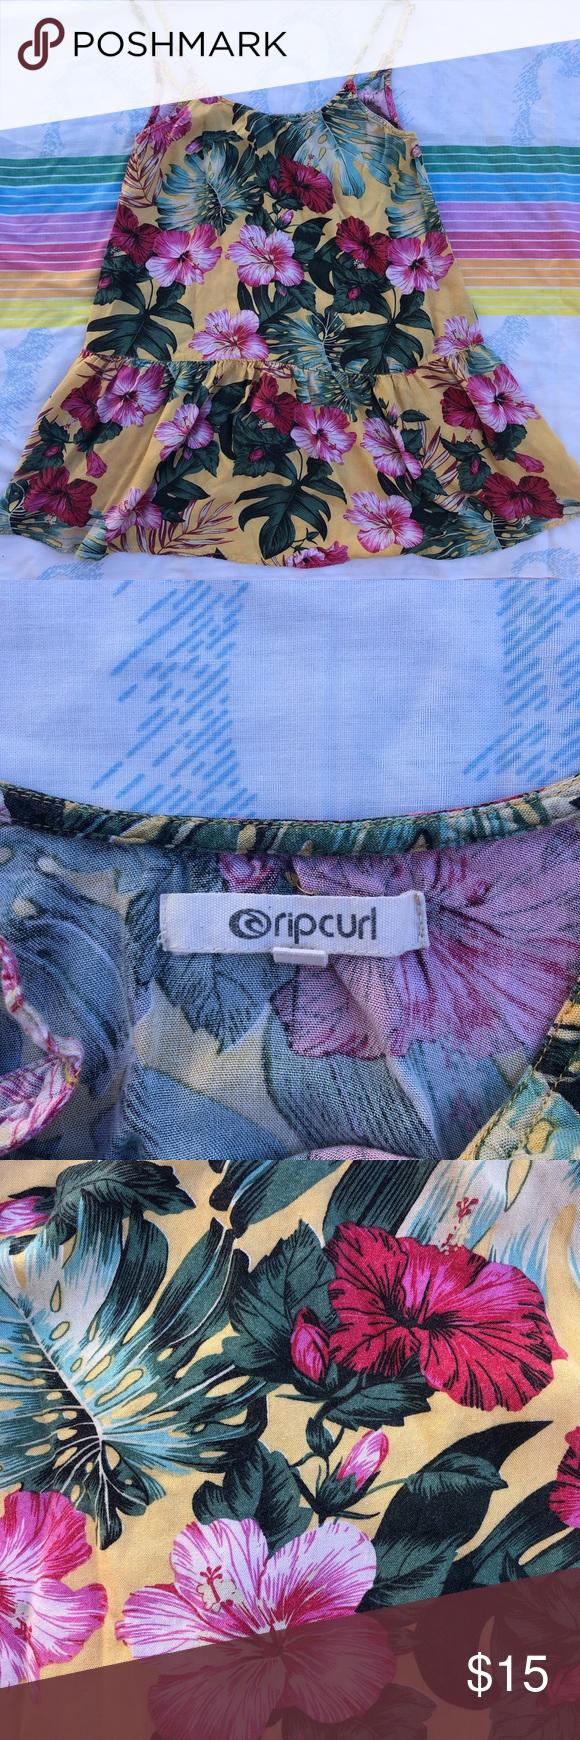 Ripcurl Sundress Ripcurl short sun dress Women's size small In good used condition Rip Curl Dresses #shortsundress